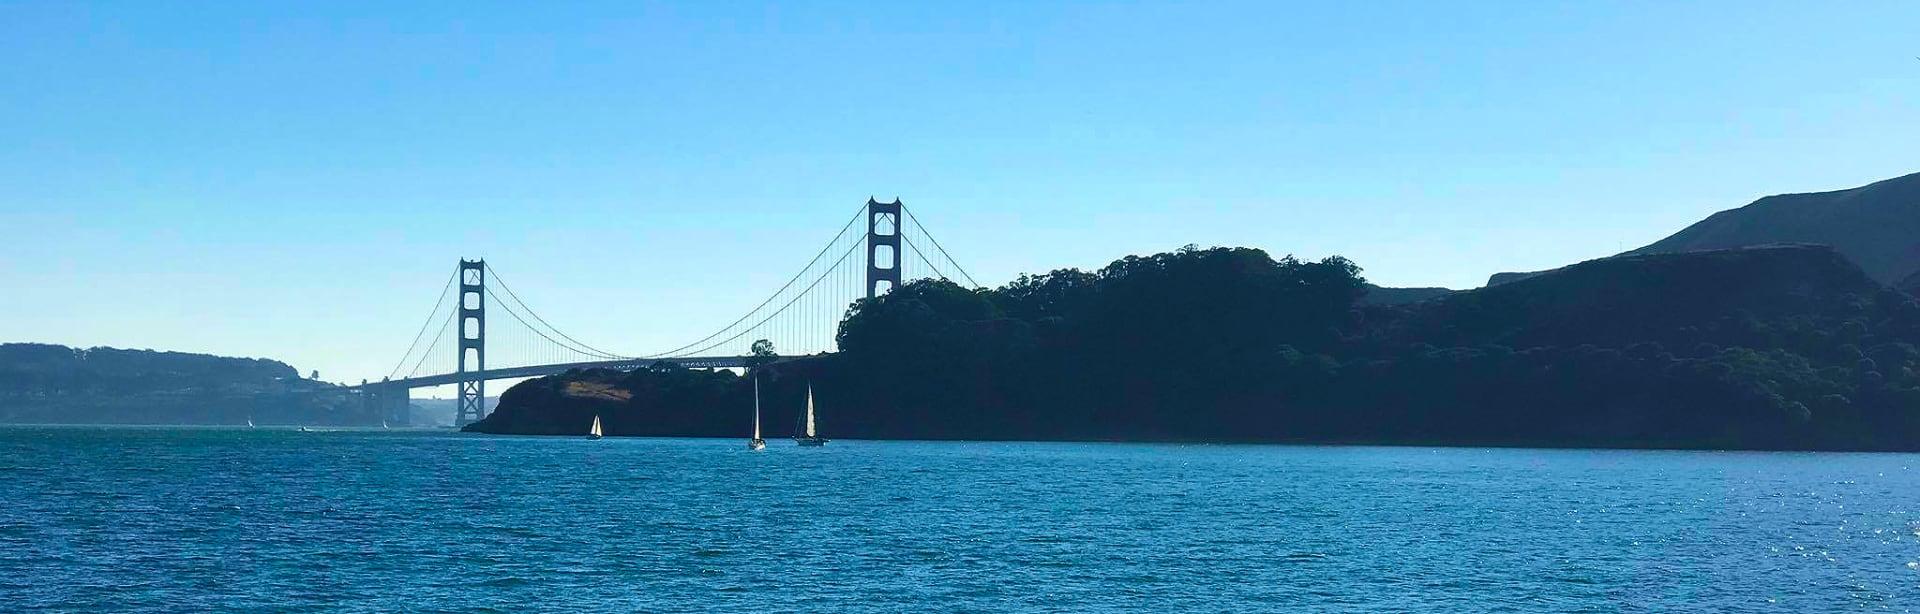 Water-view-Golden-Gate-Bridge.jpg